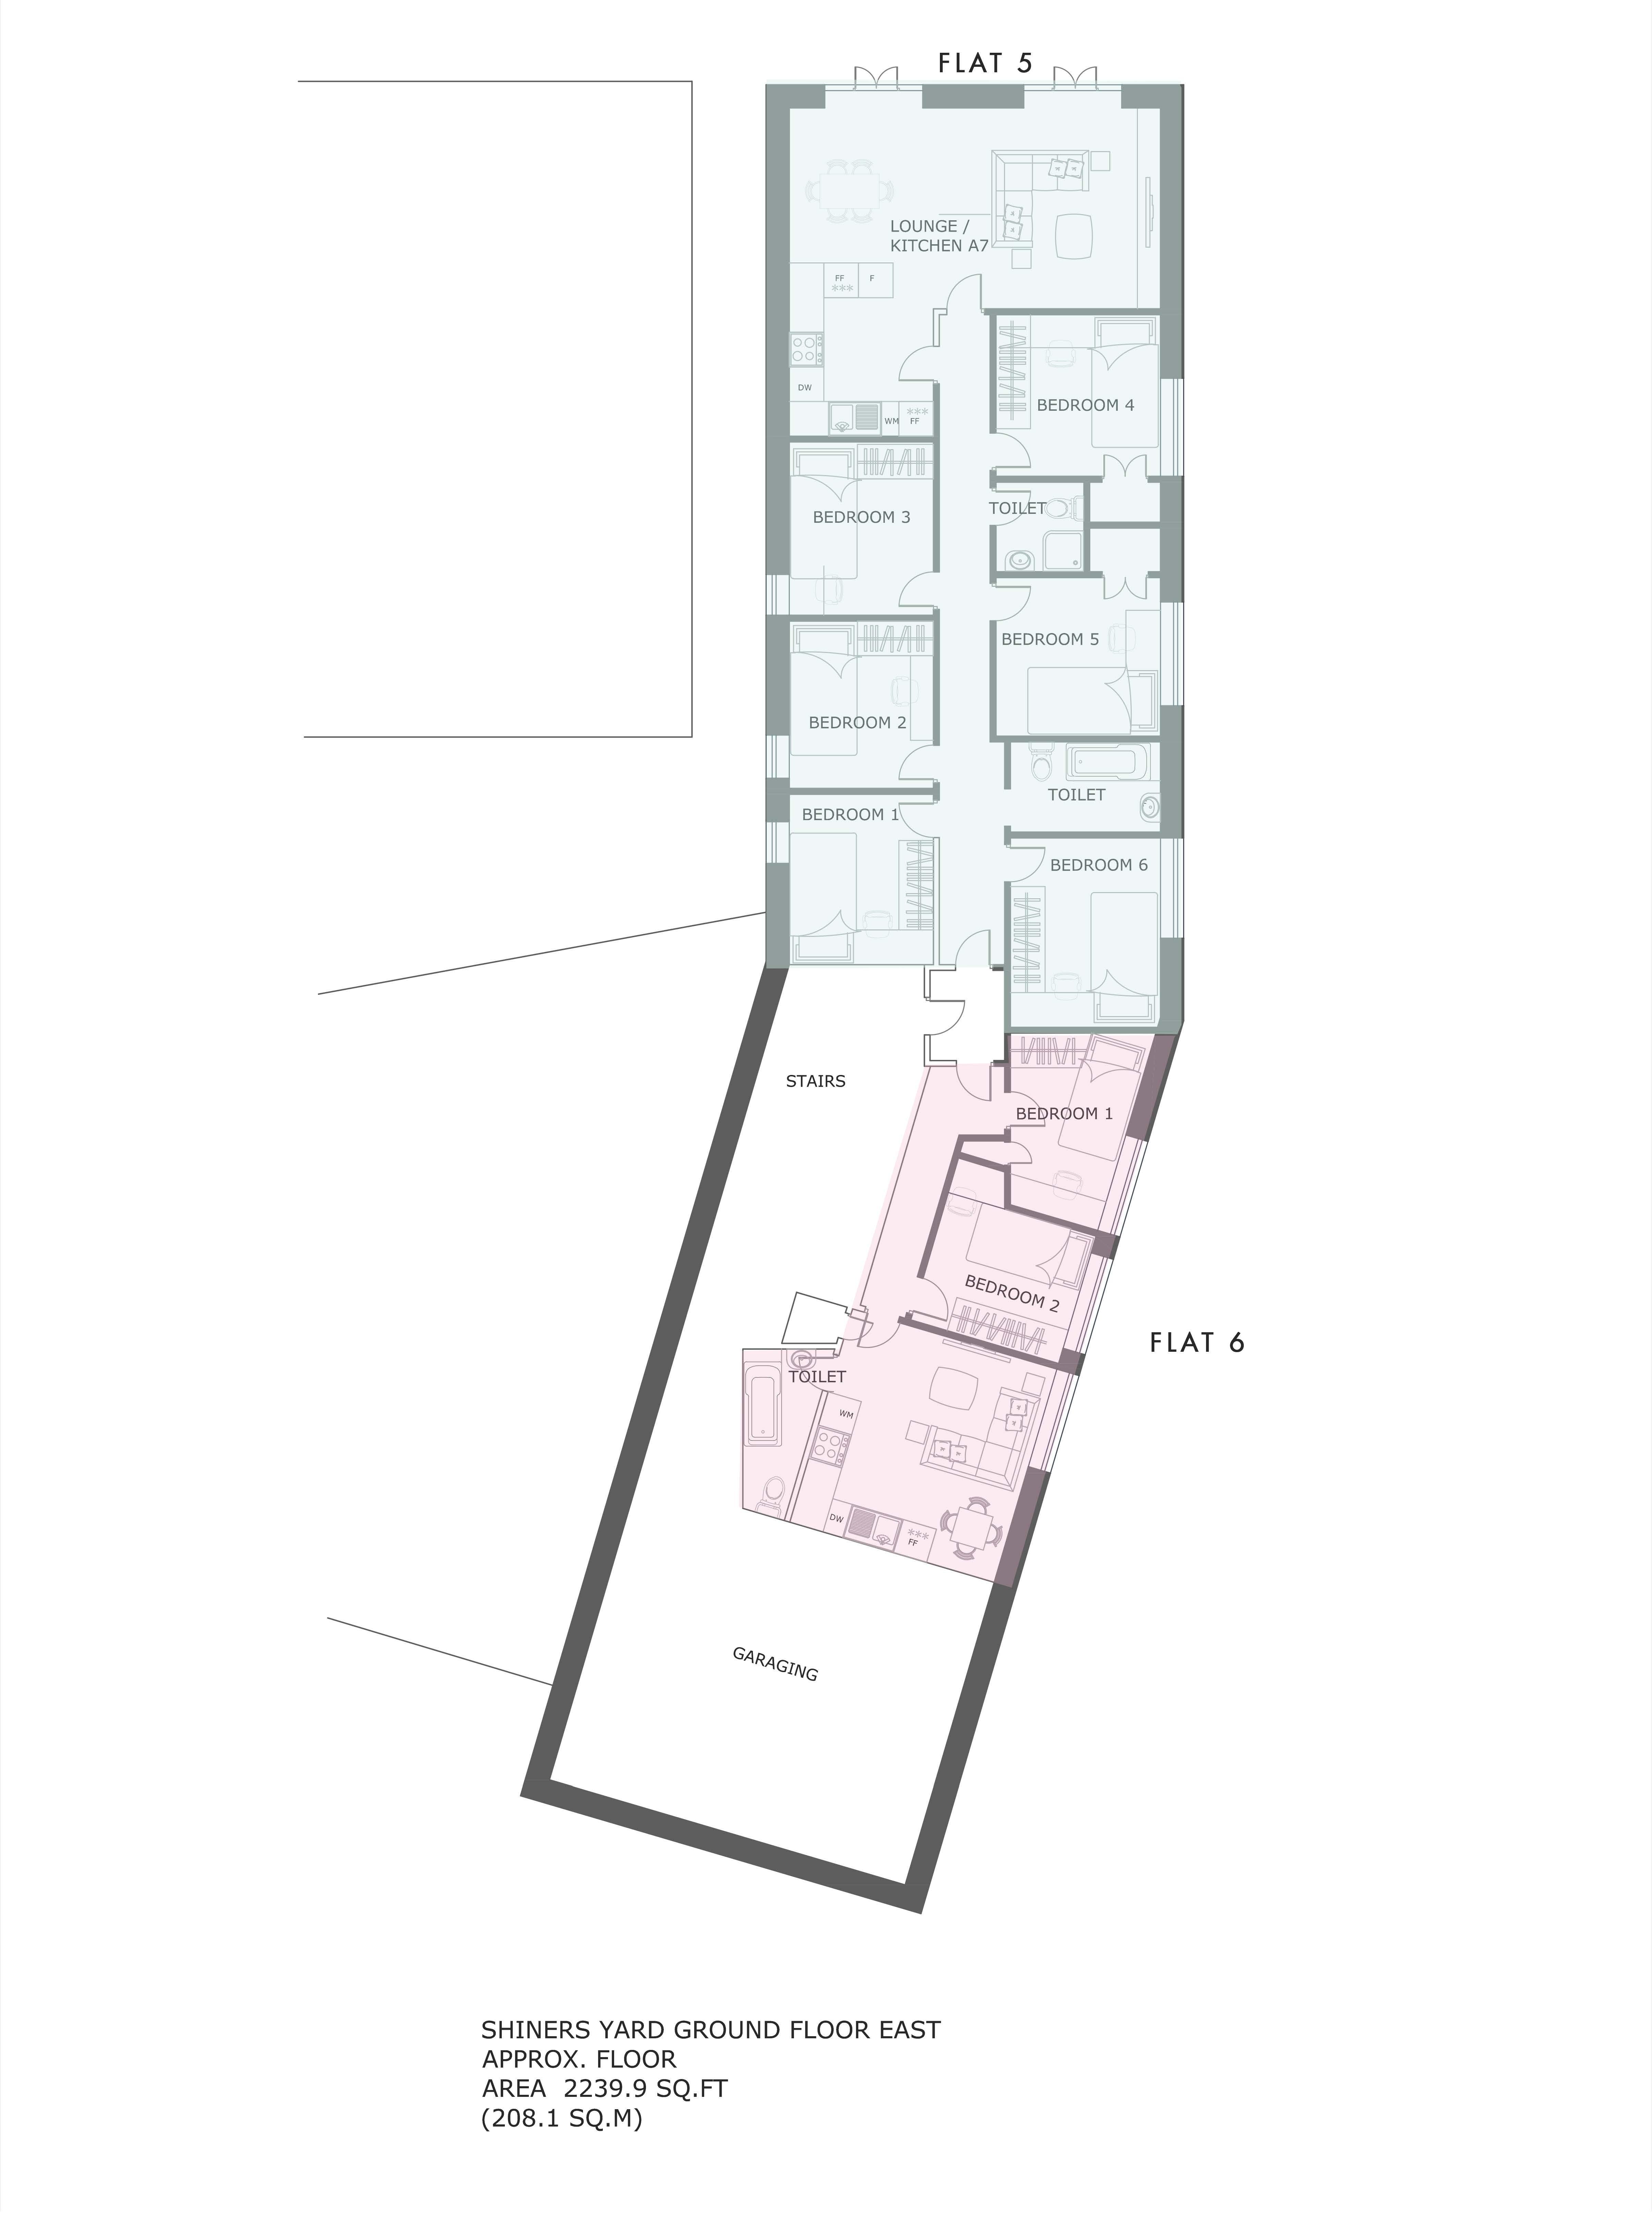 Flat 5 Shiners Yard, floorplans